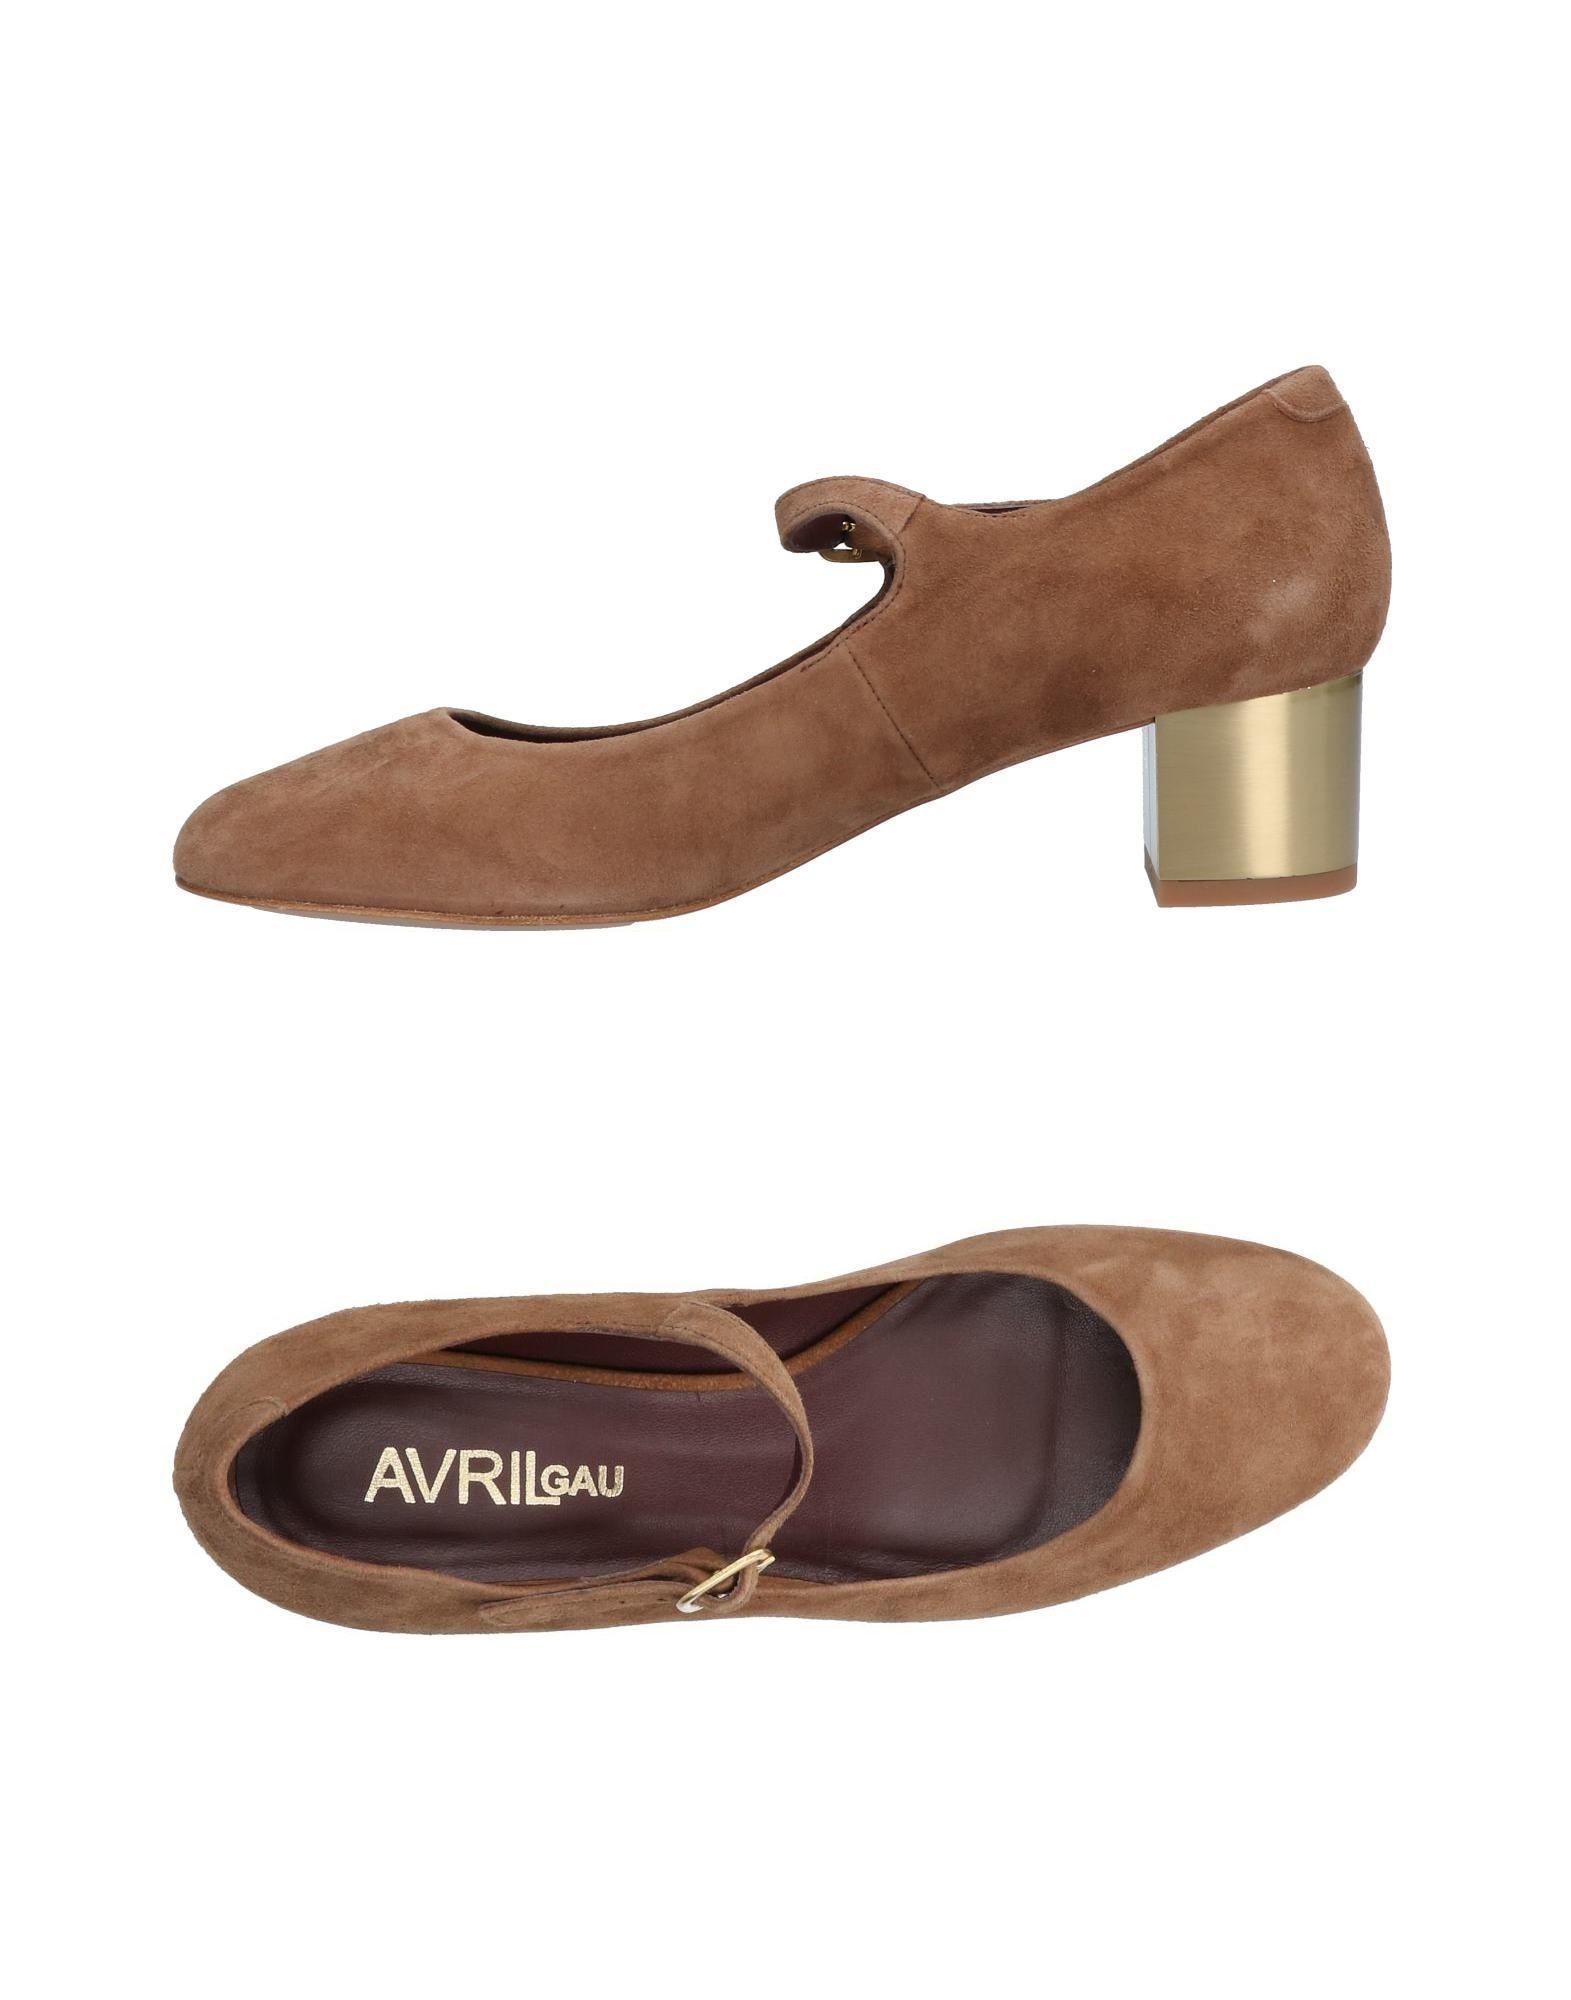 Avril Gau Pumps Damen  11430375BW Gute Qualität beliebte Schuhe